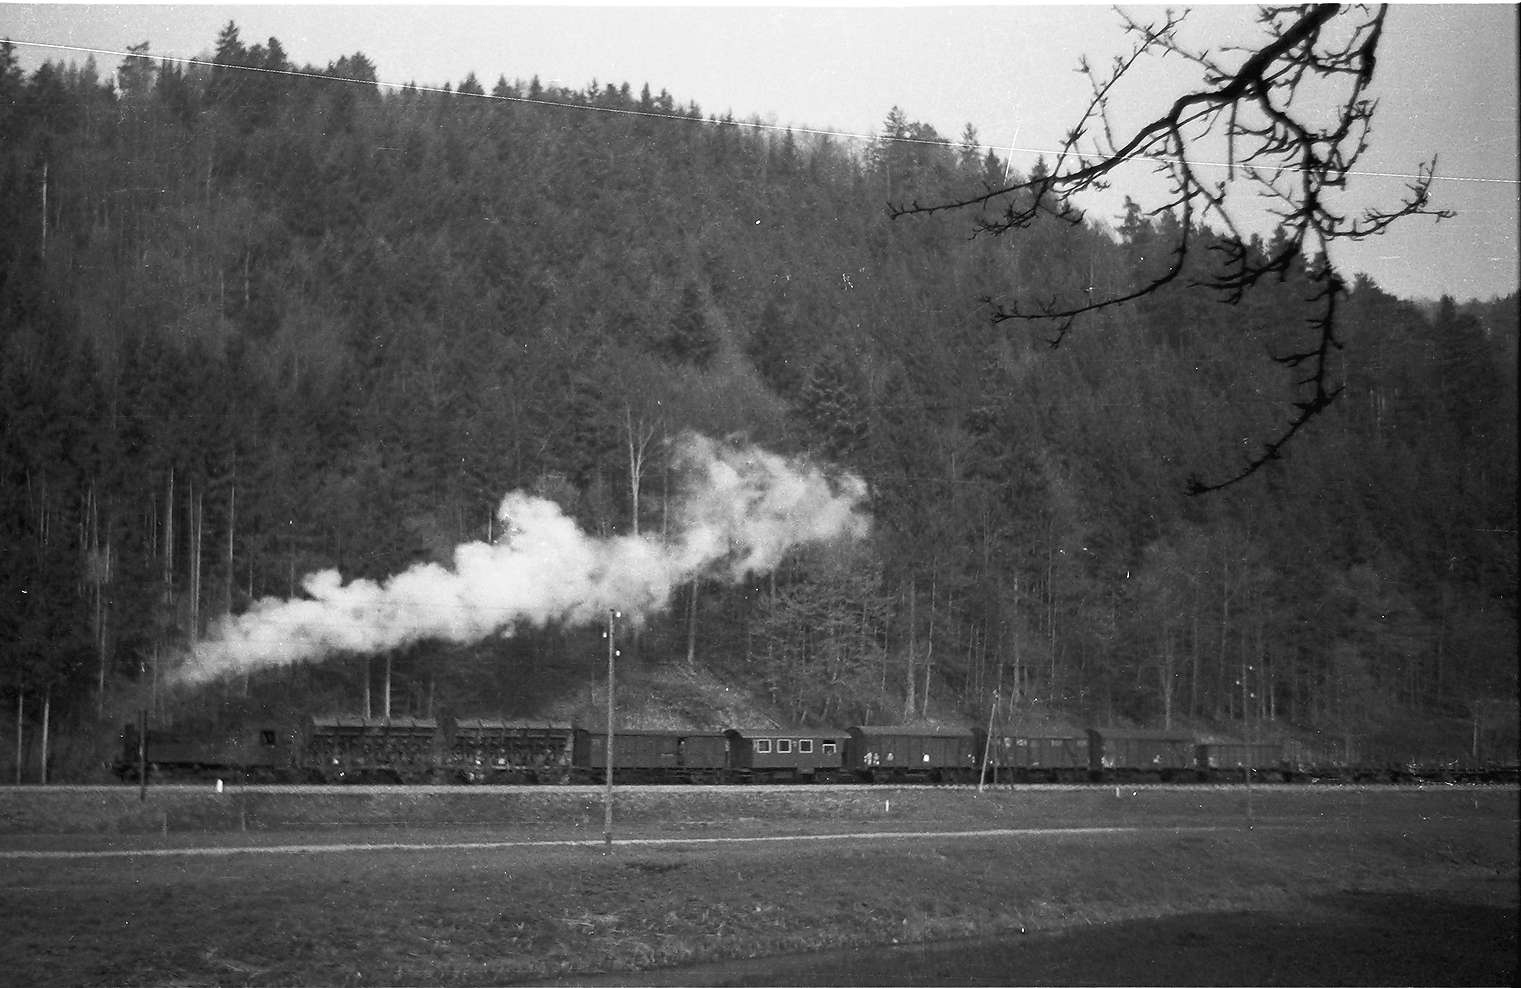 Lok 21, G(St) 305, Strecke Mühringen - Bad Imnau, Eyachtal, Bild 1